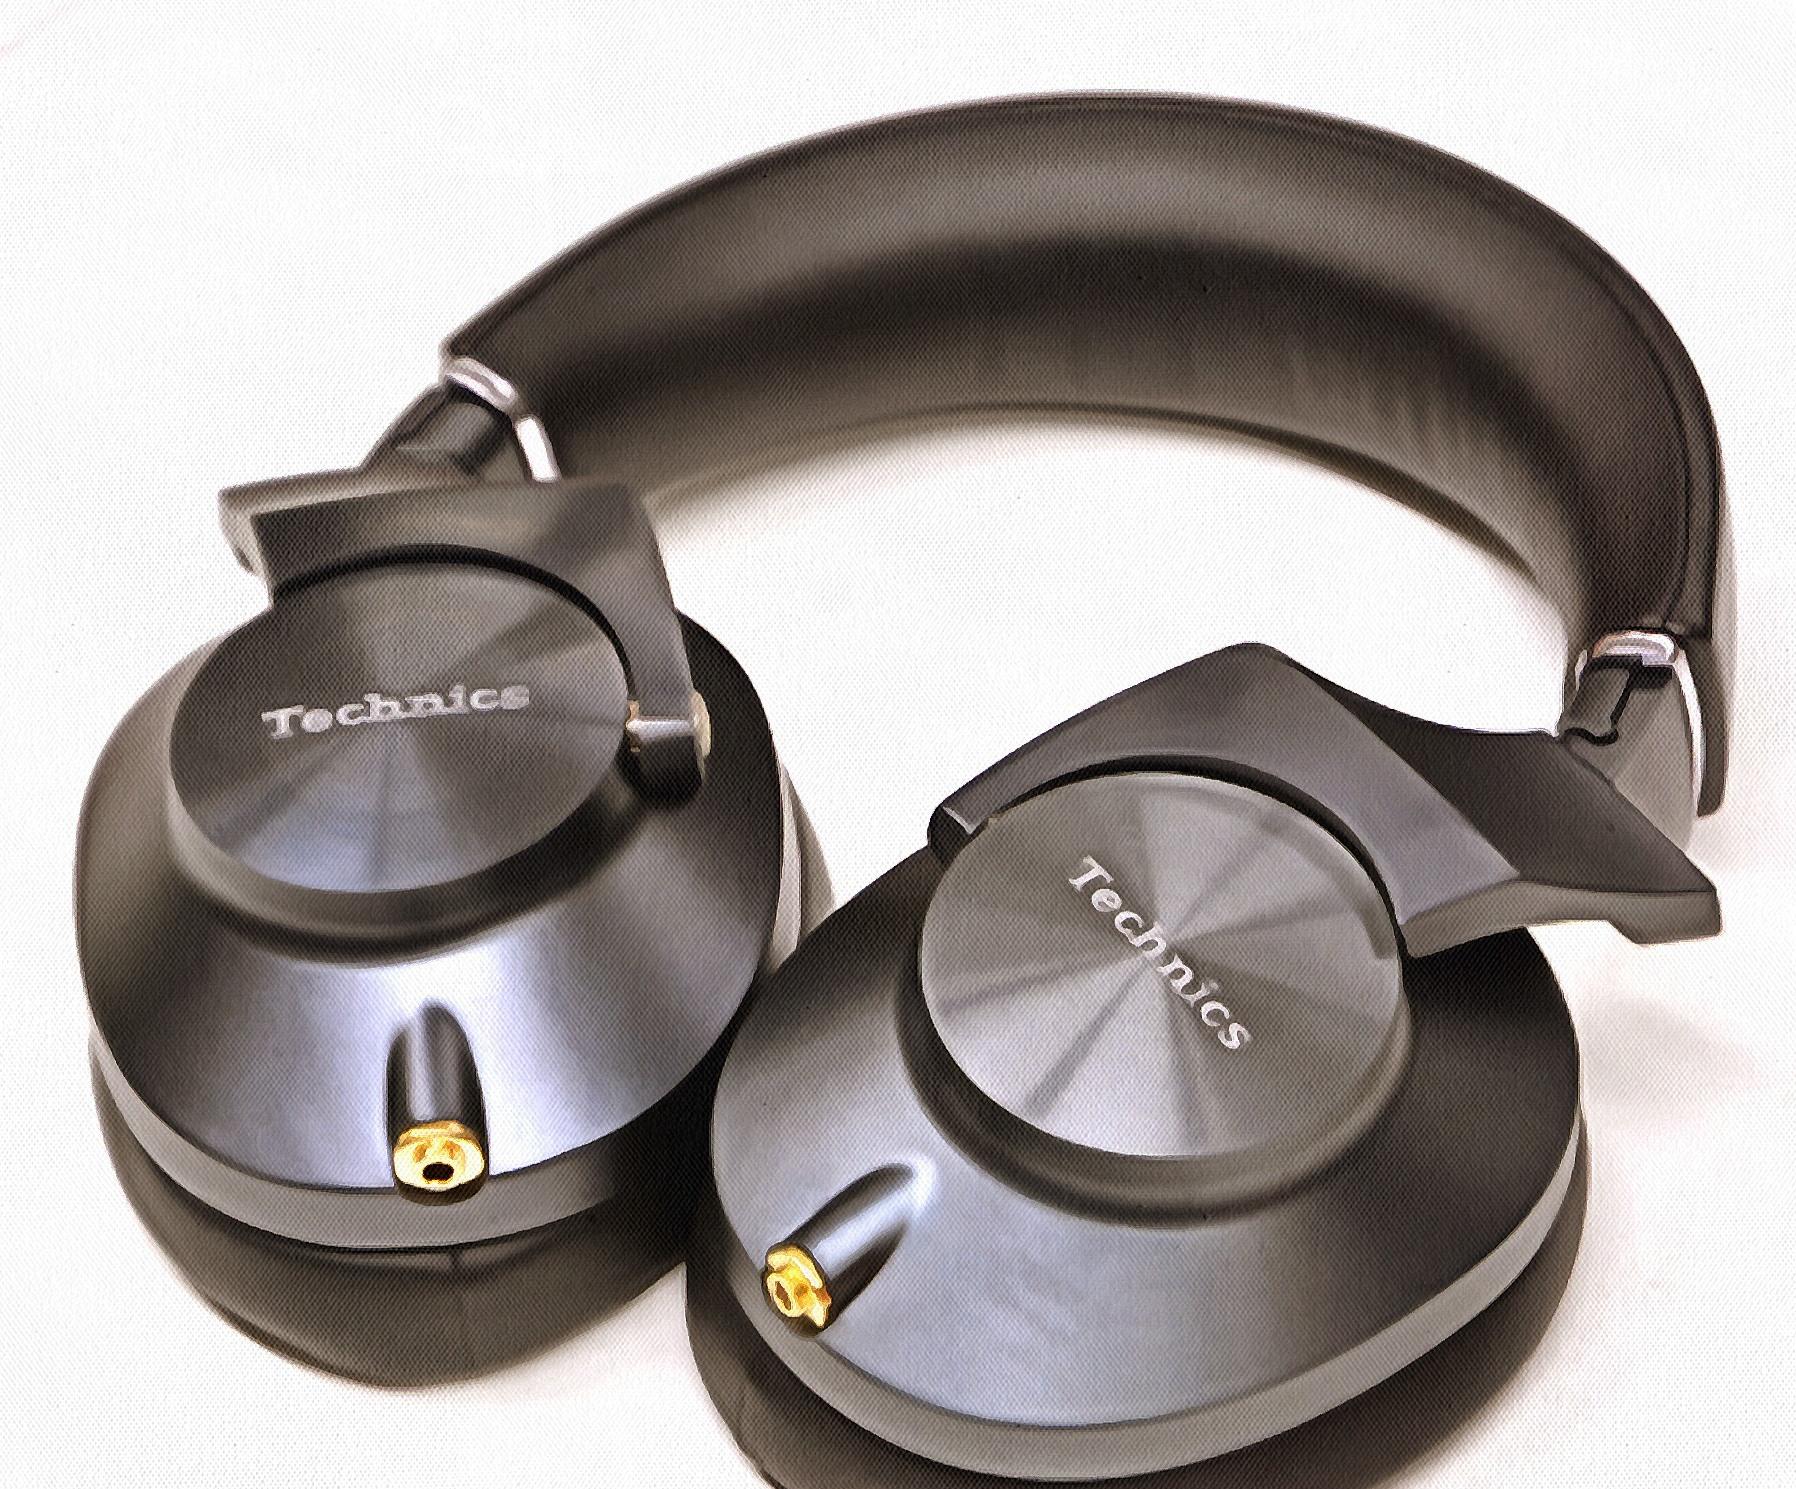 technics eah t700